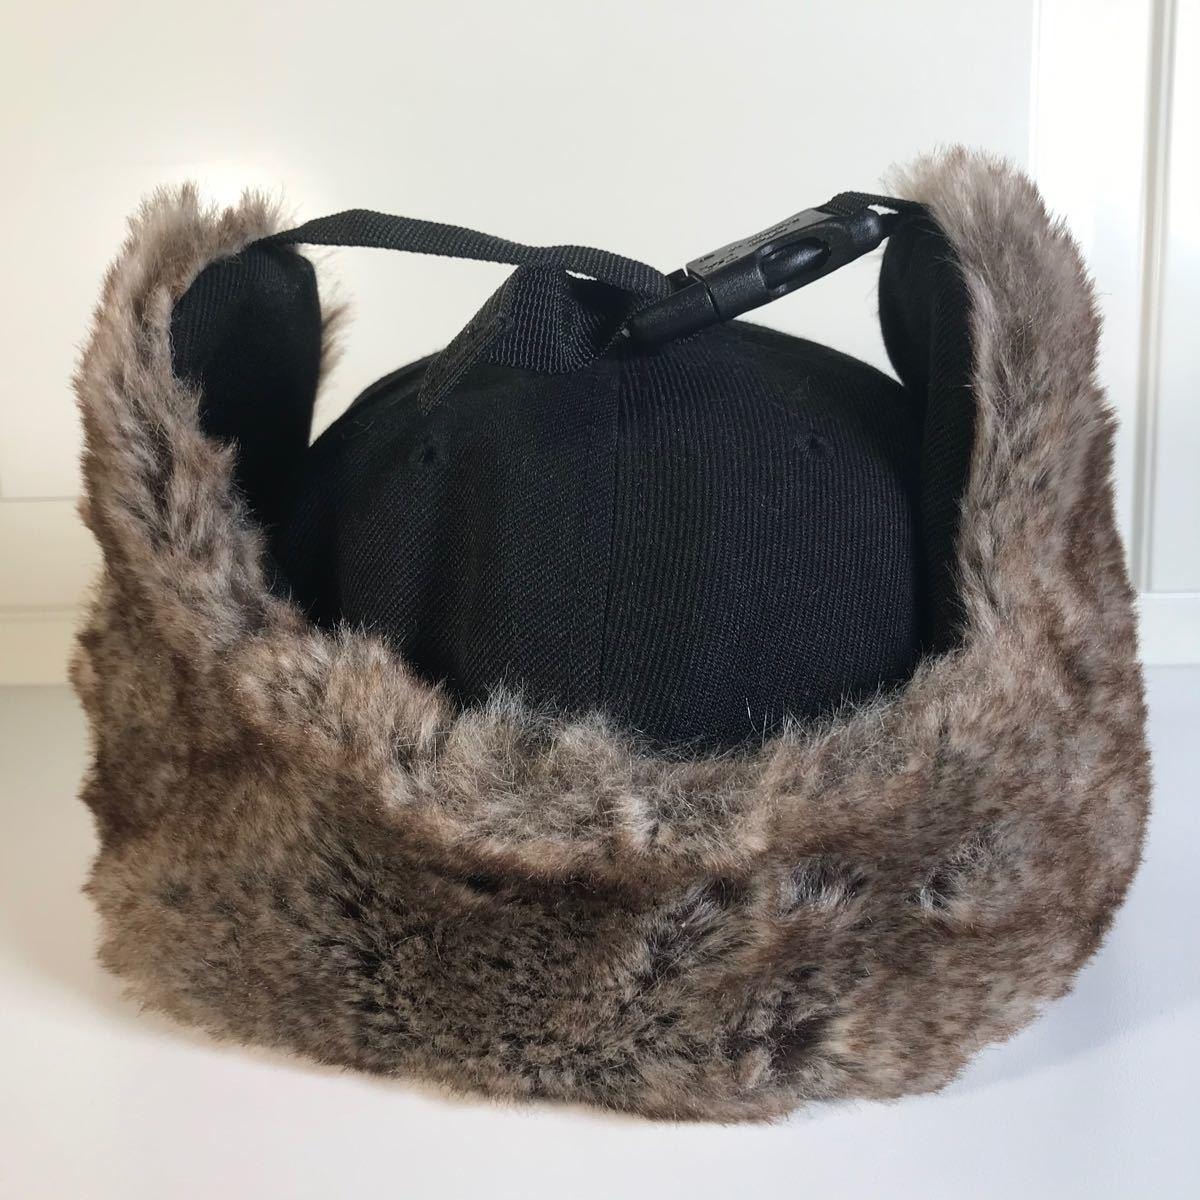 帽子 キャップ BEN DAVIS FLAP BB CAP  新品未使用送料無料